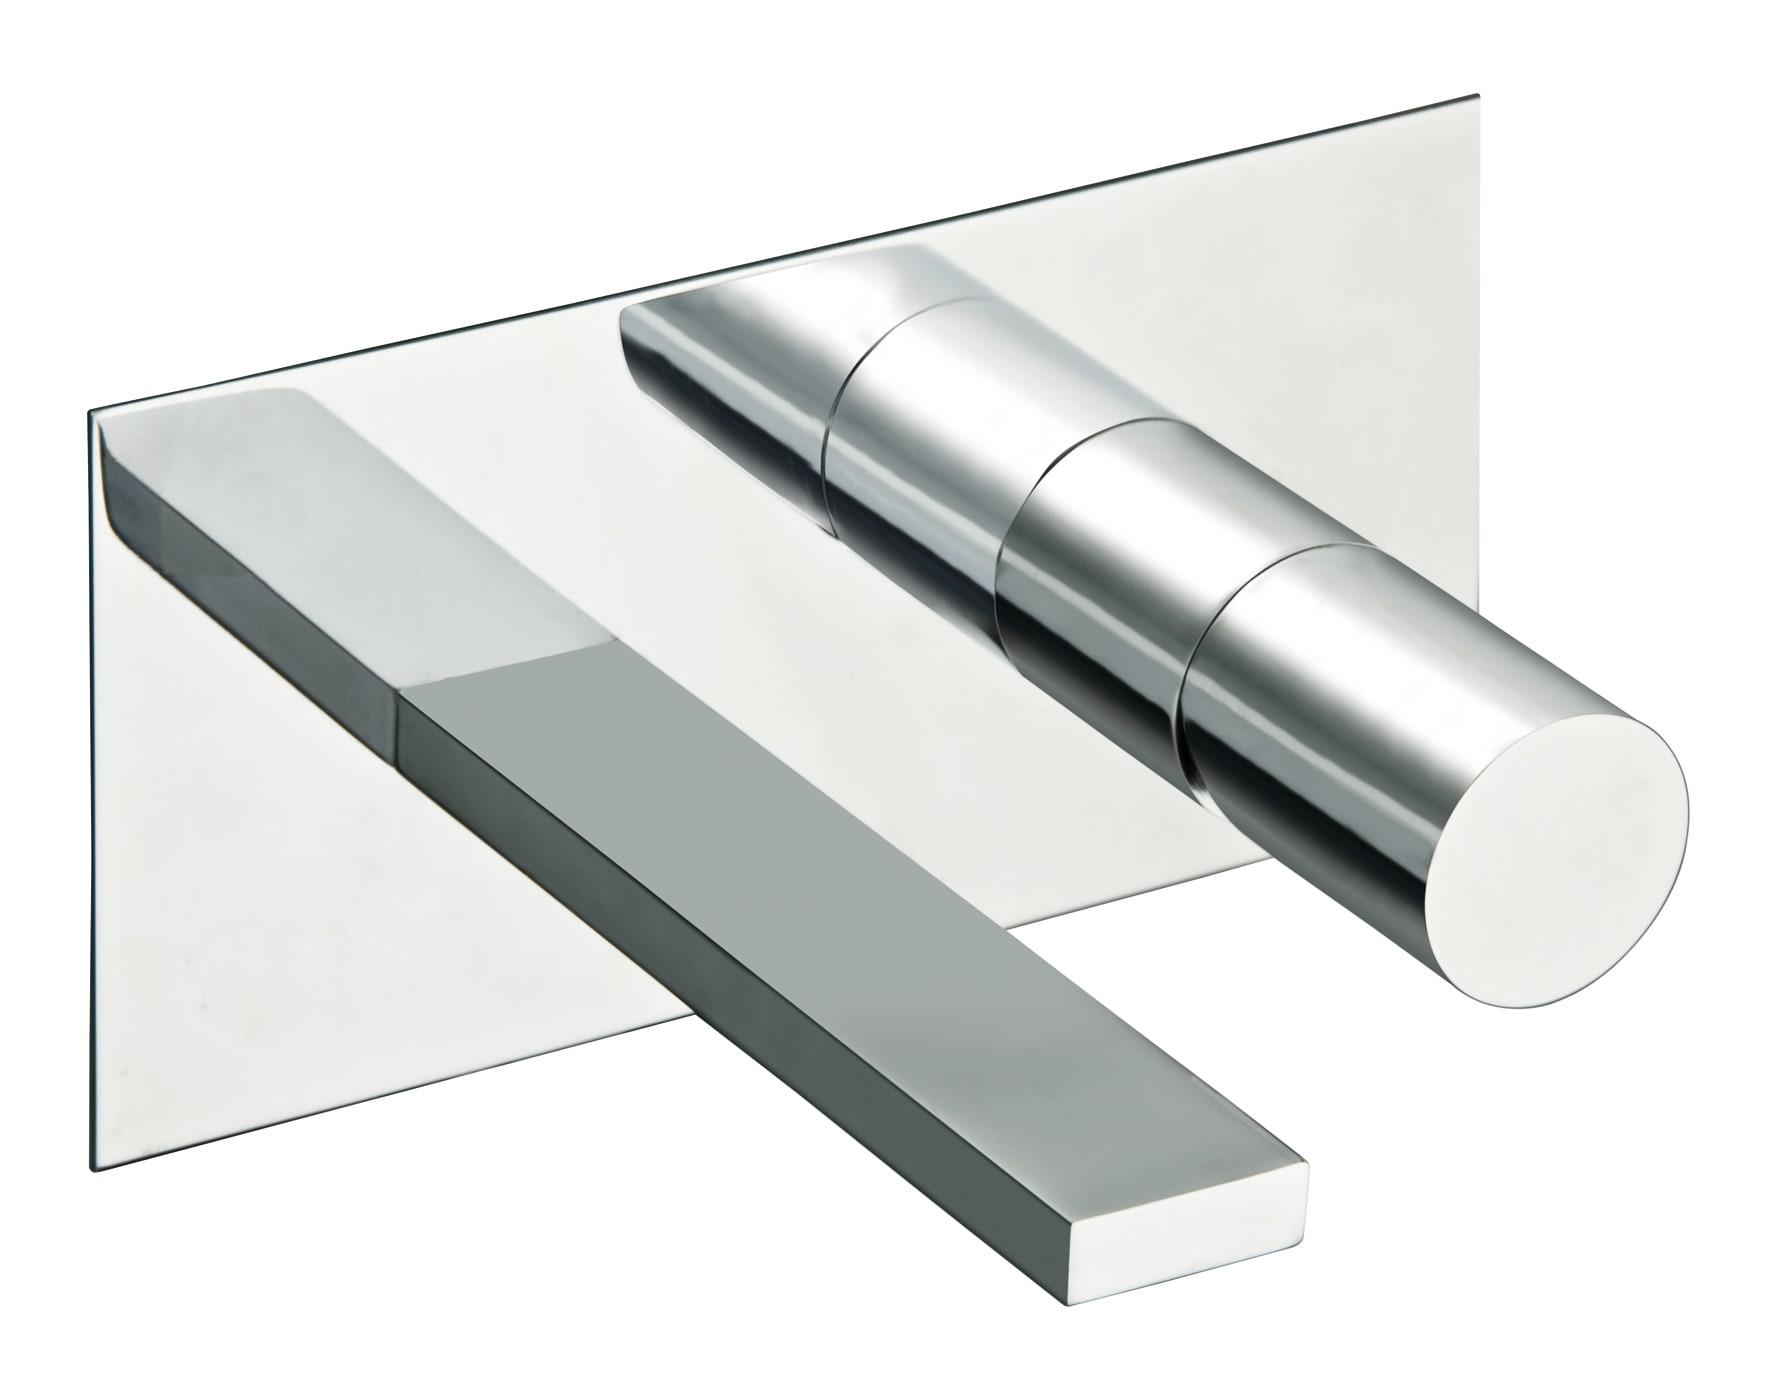 Artos F301-6 Otella In Wall Lav Faucet   QualityBath.com